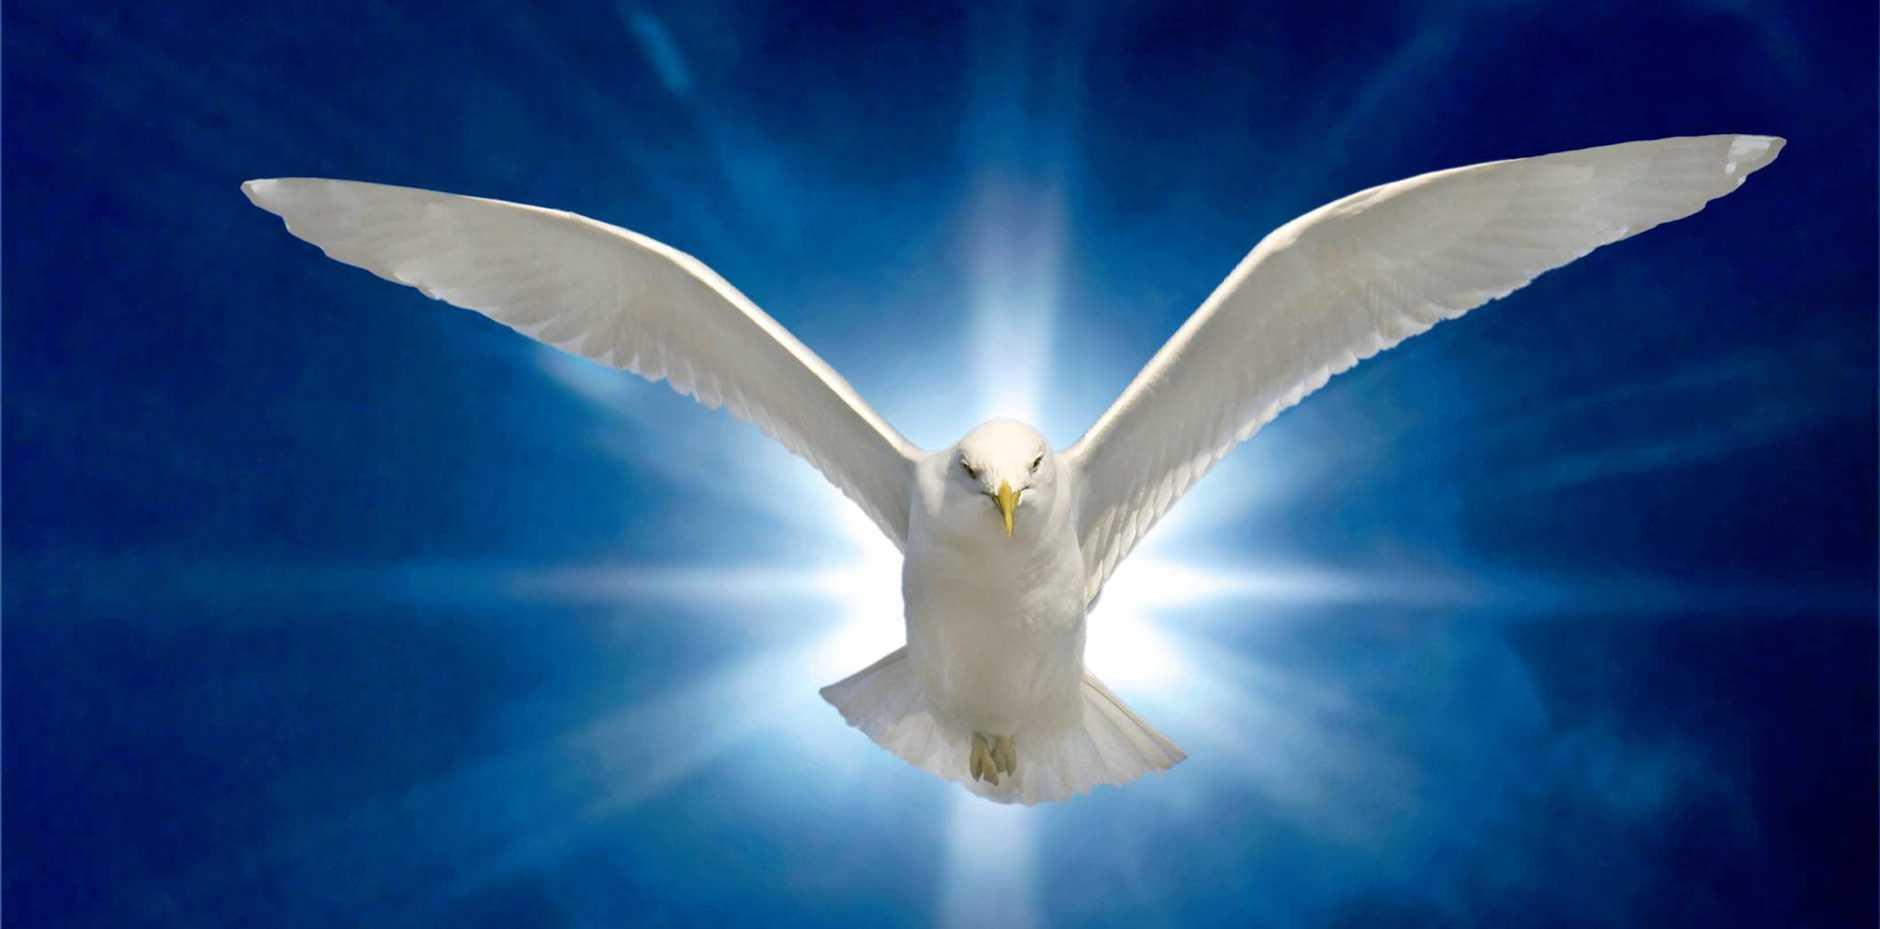 Holy Spirit Dove on Royal Blue Starburst Background